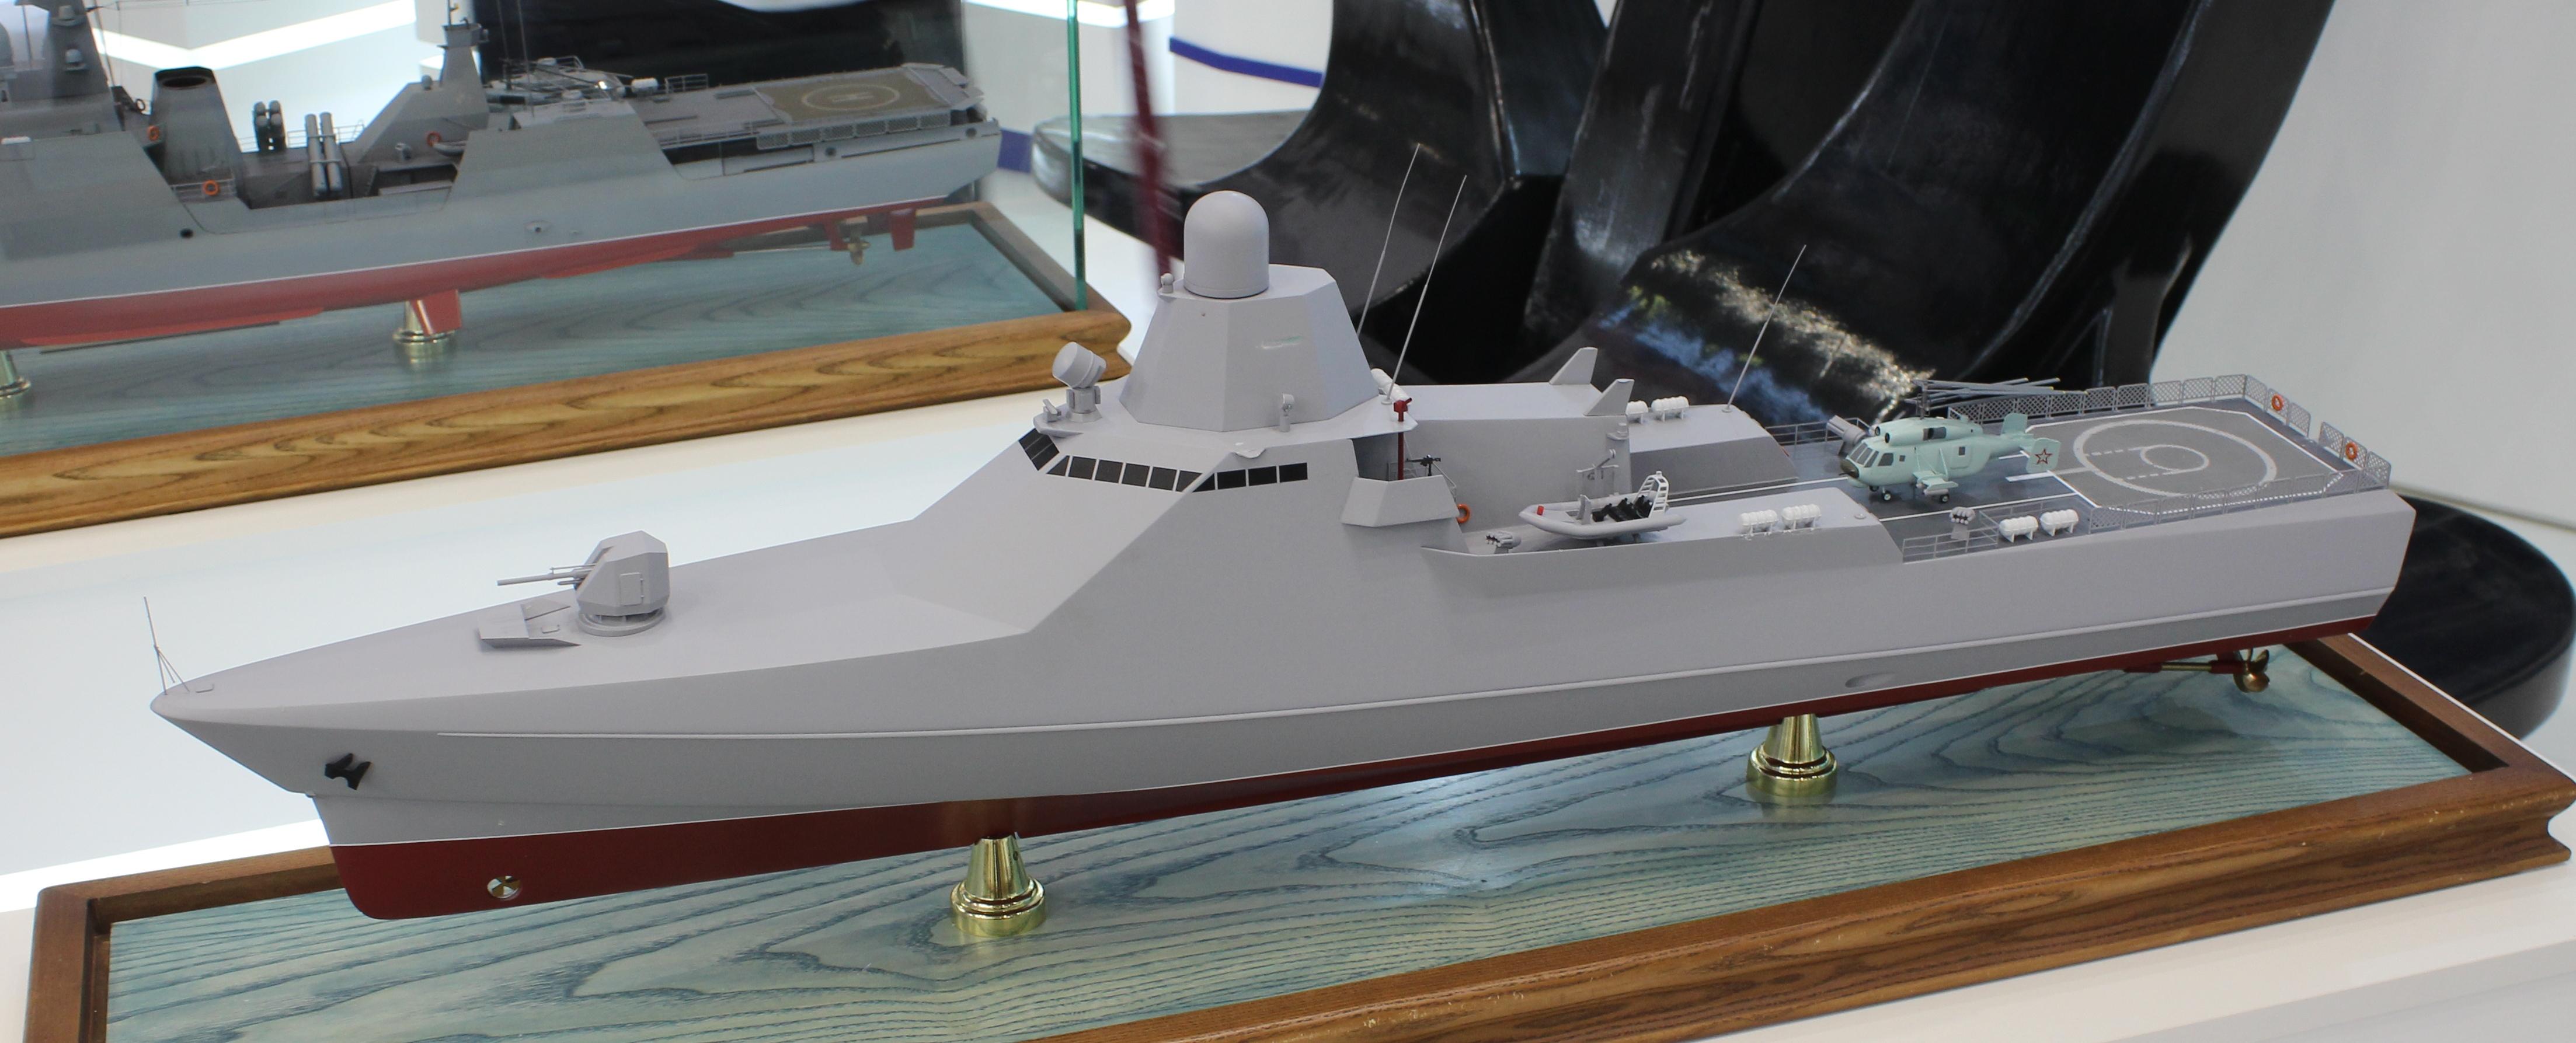 Project 22160 Bykov-class patrol ship - Page 6 30-5141453-22160-ka-29tb